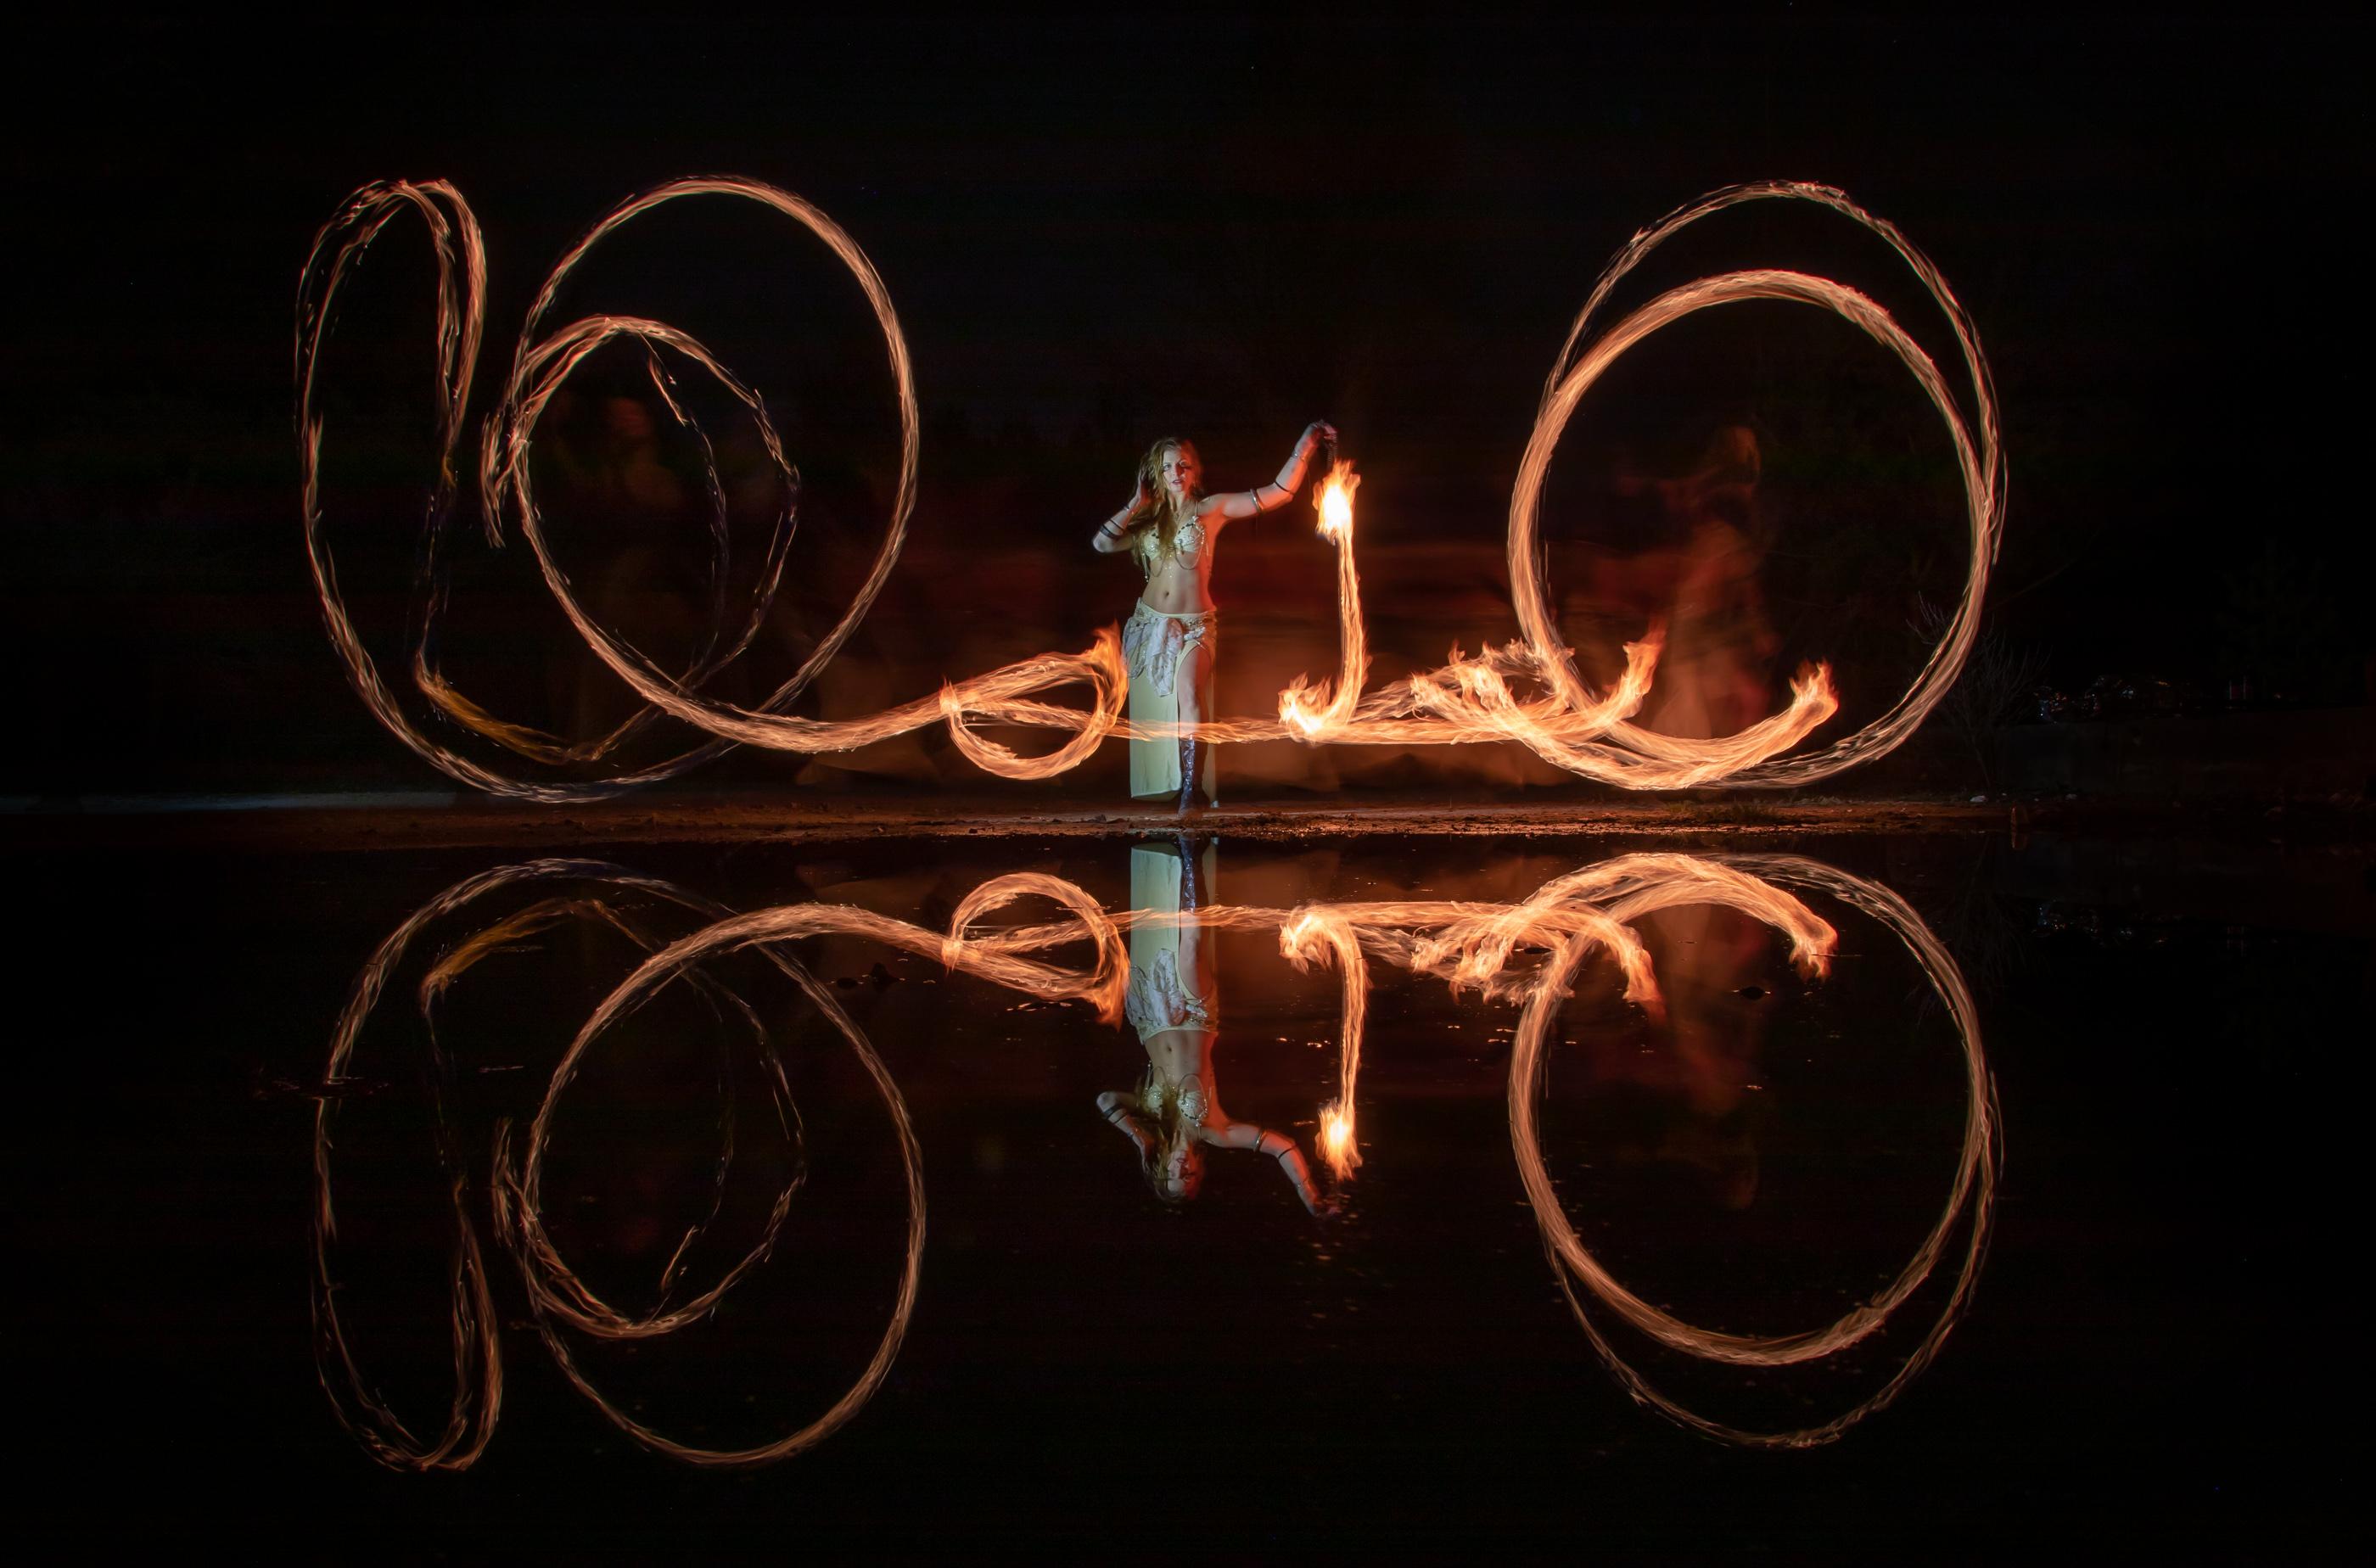 2020_03_22_AndromedaFire-FireLP (74)-LR-2.jpg